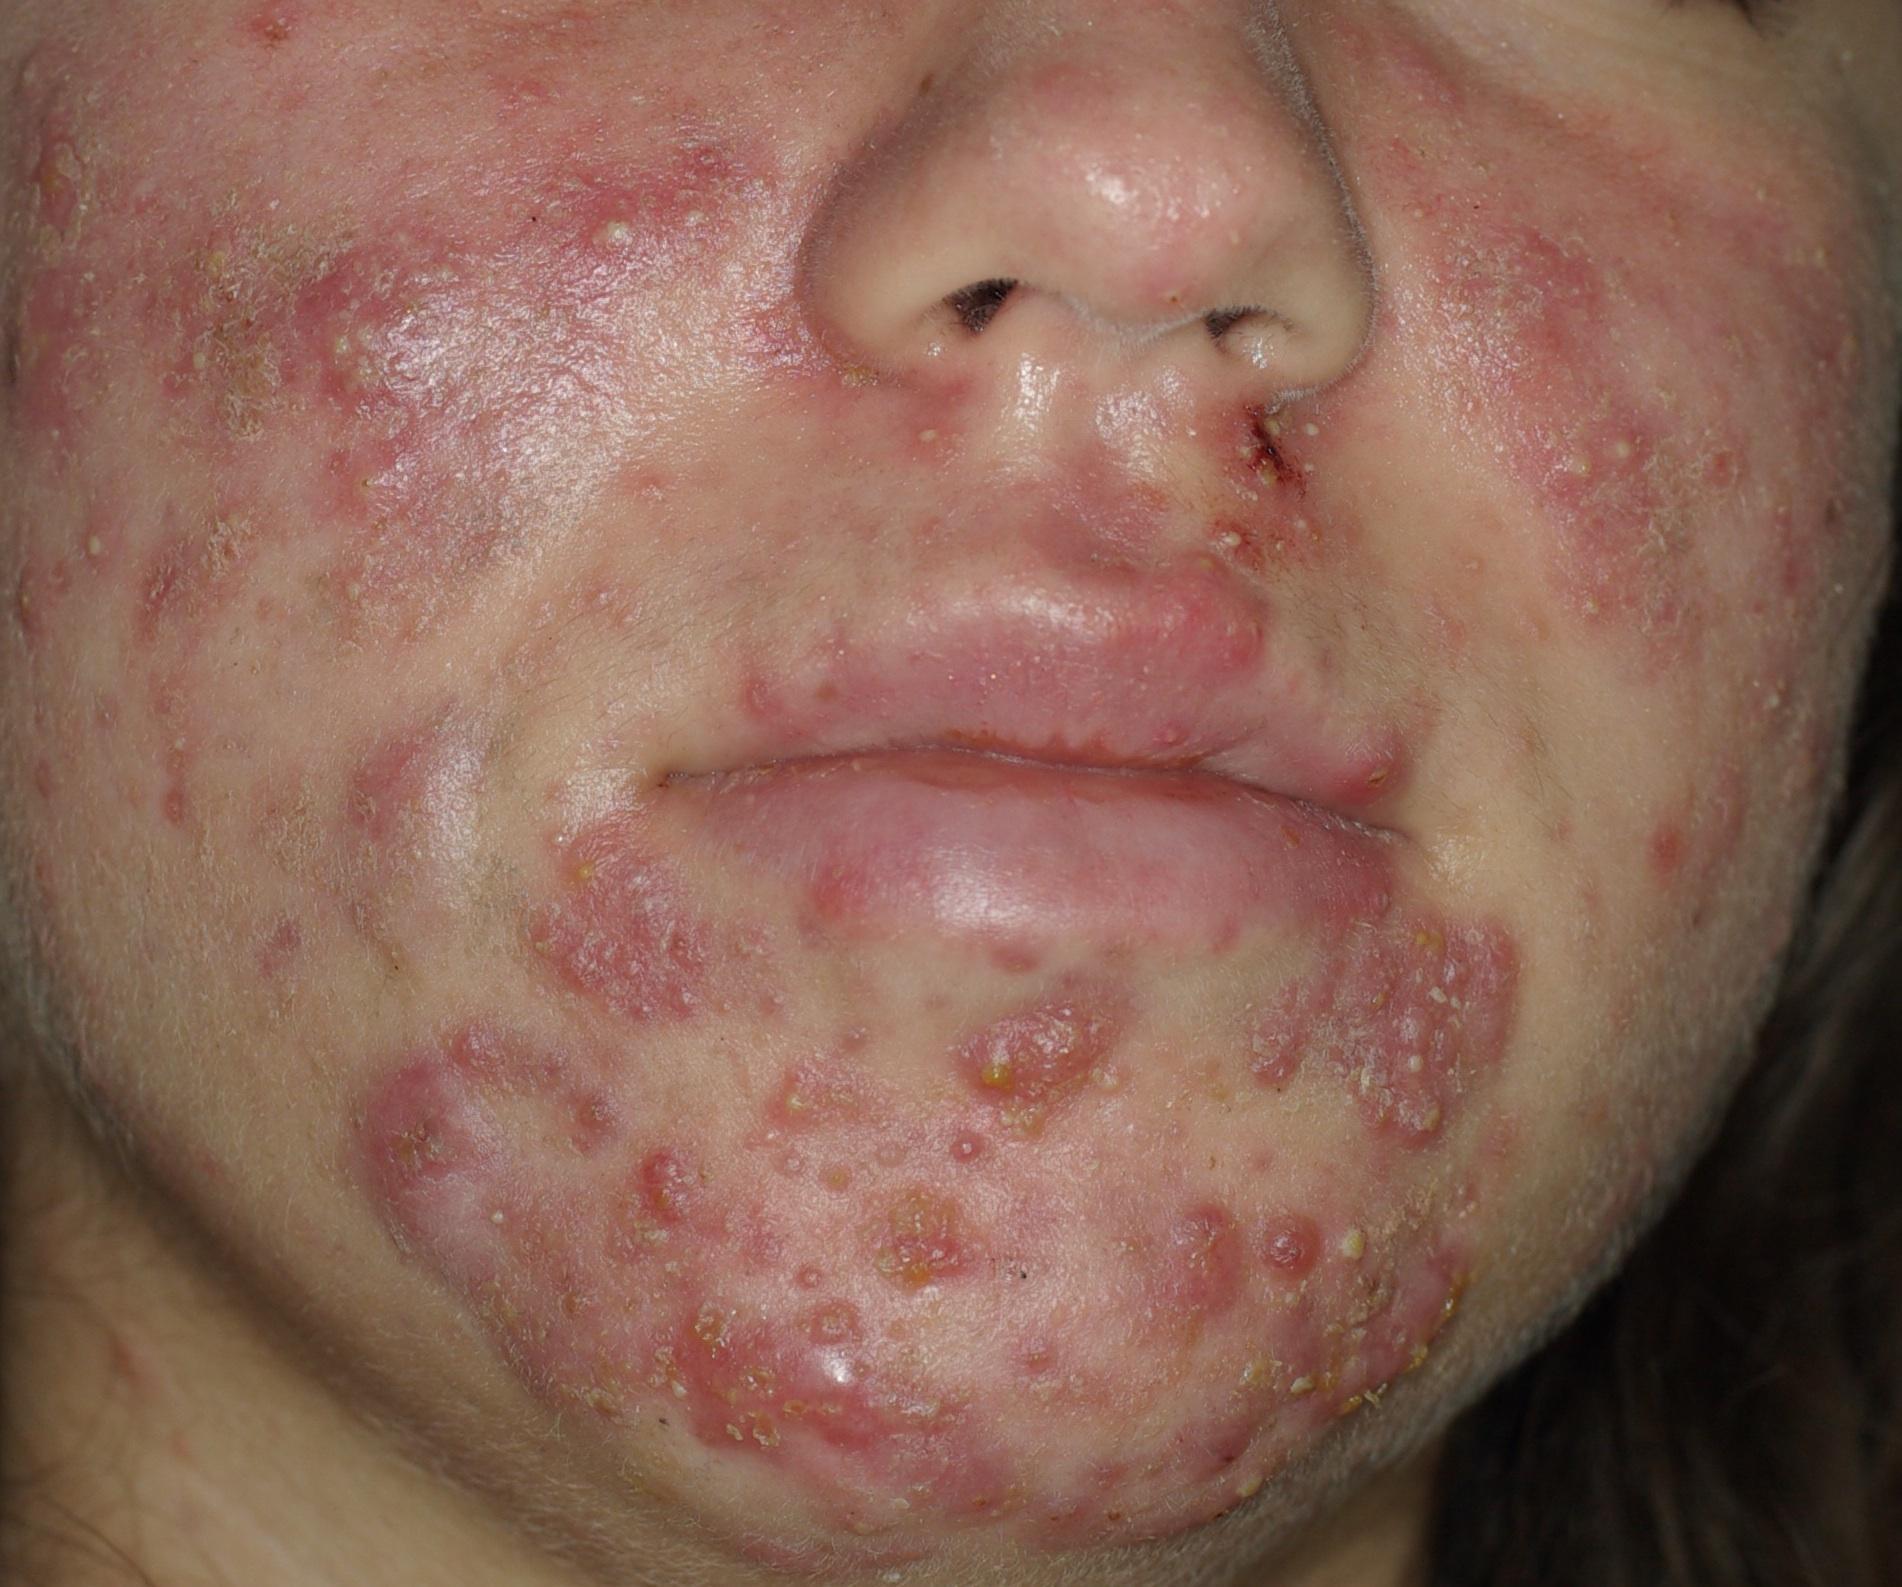 acné inflammatoire, nodules